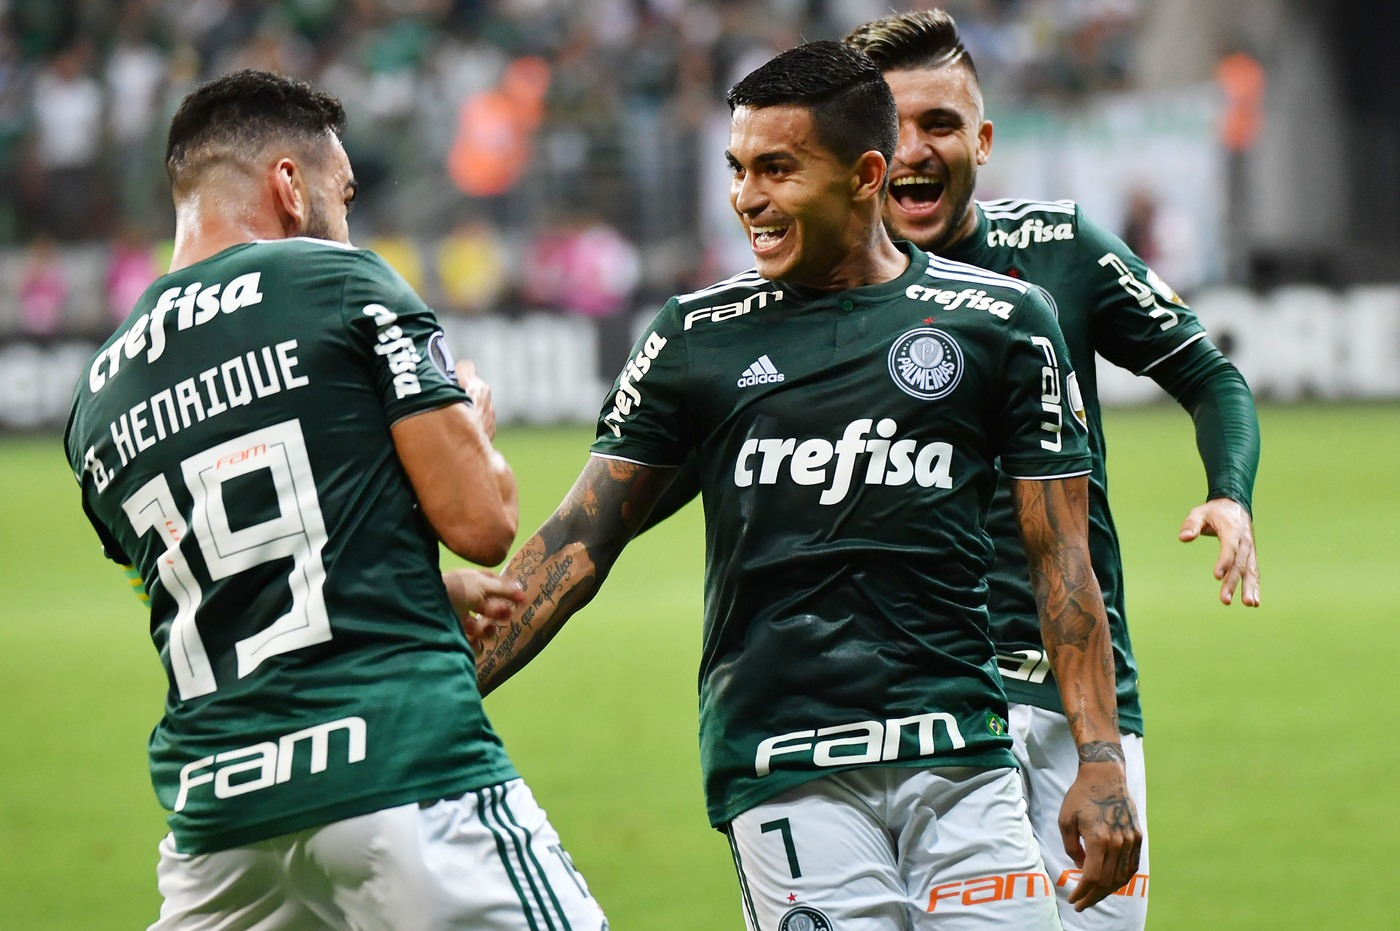 Palmeiras-Avai giovedì 13 giugno